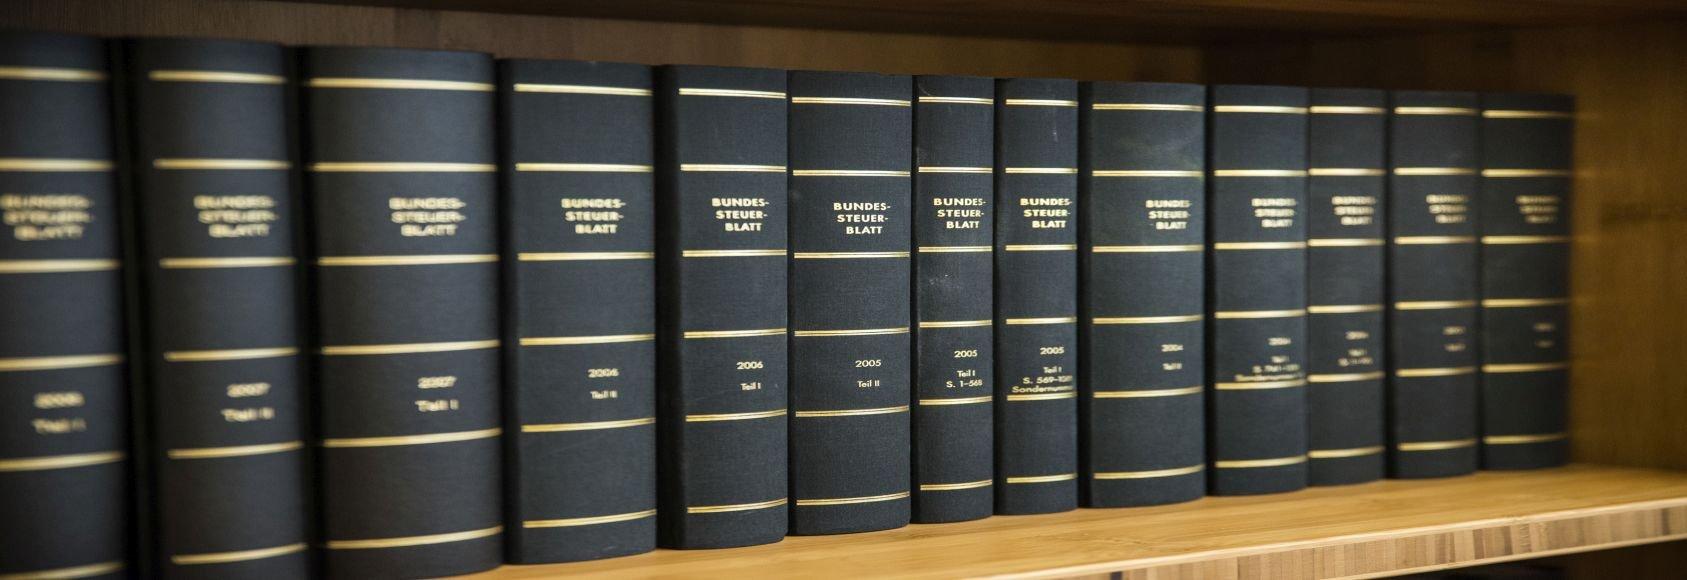 Bücher im Regal, Büchersammlung, Bücherregal, Steuerberatung